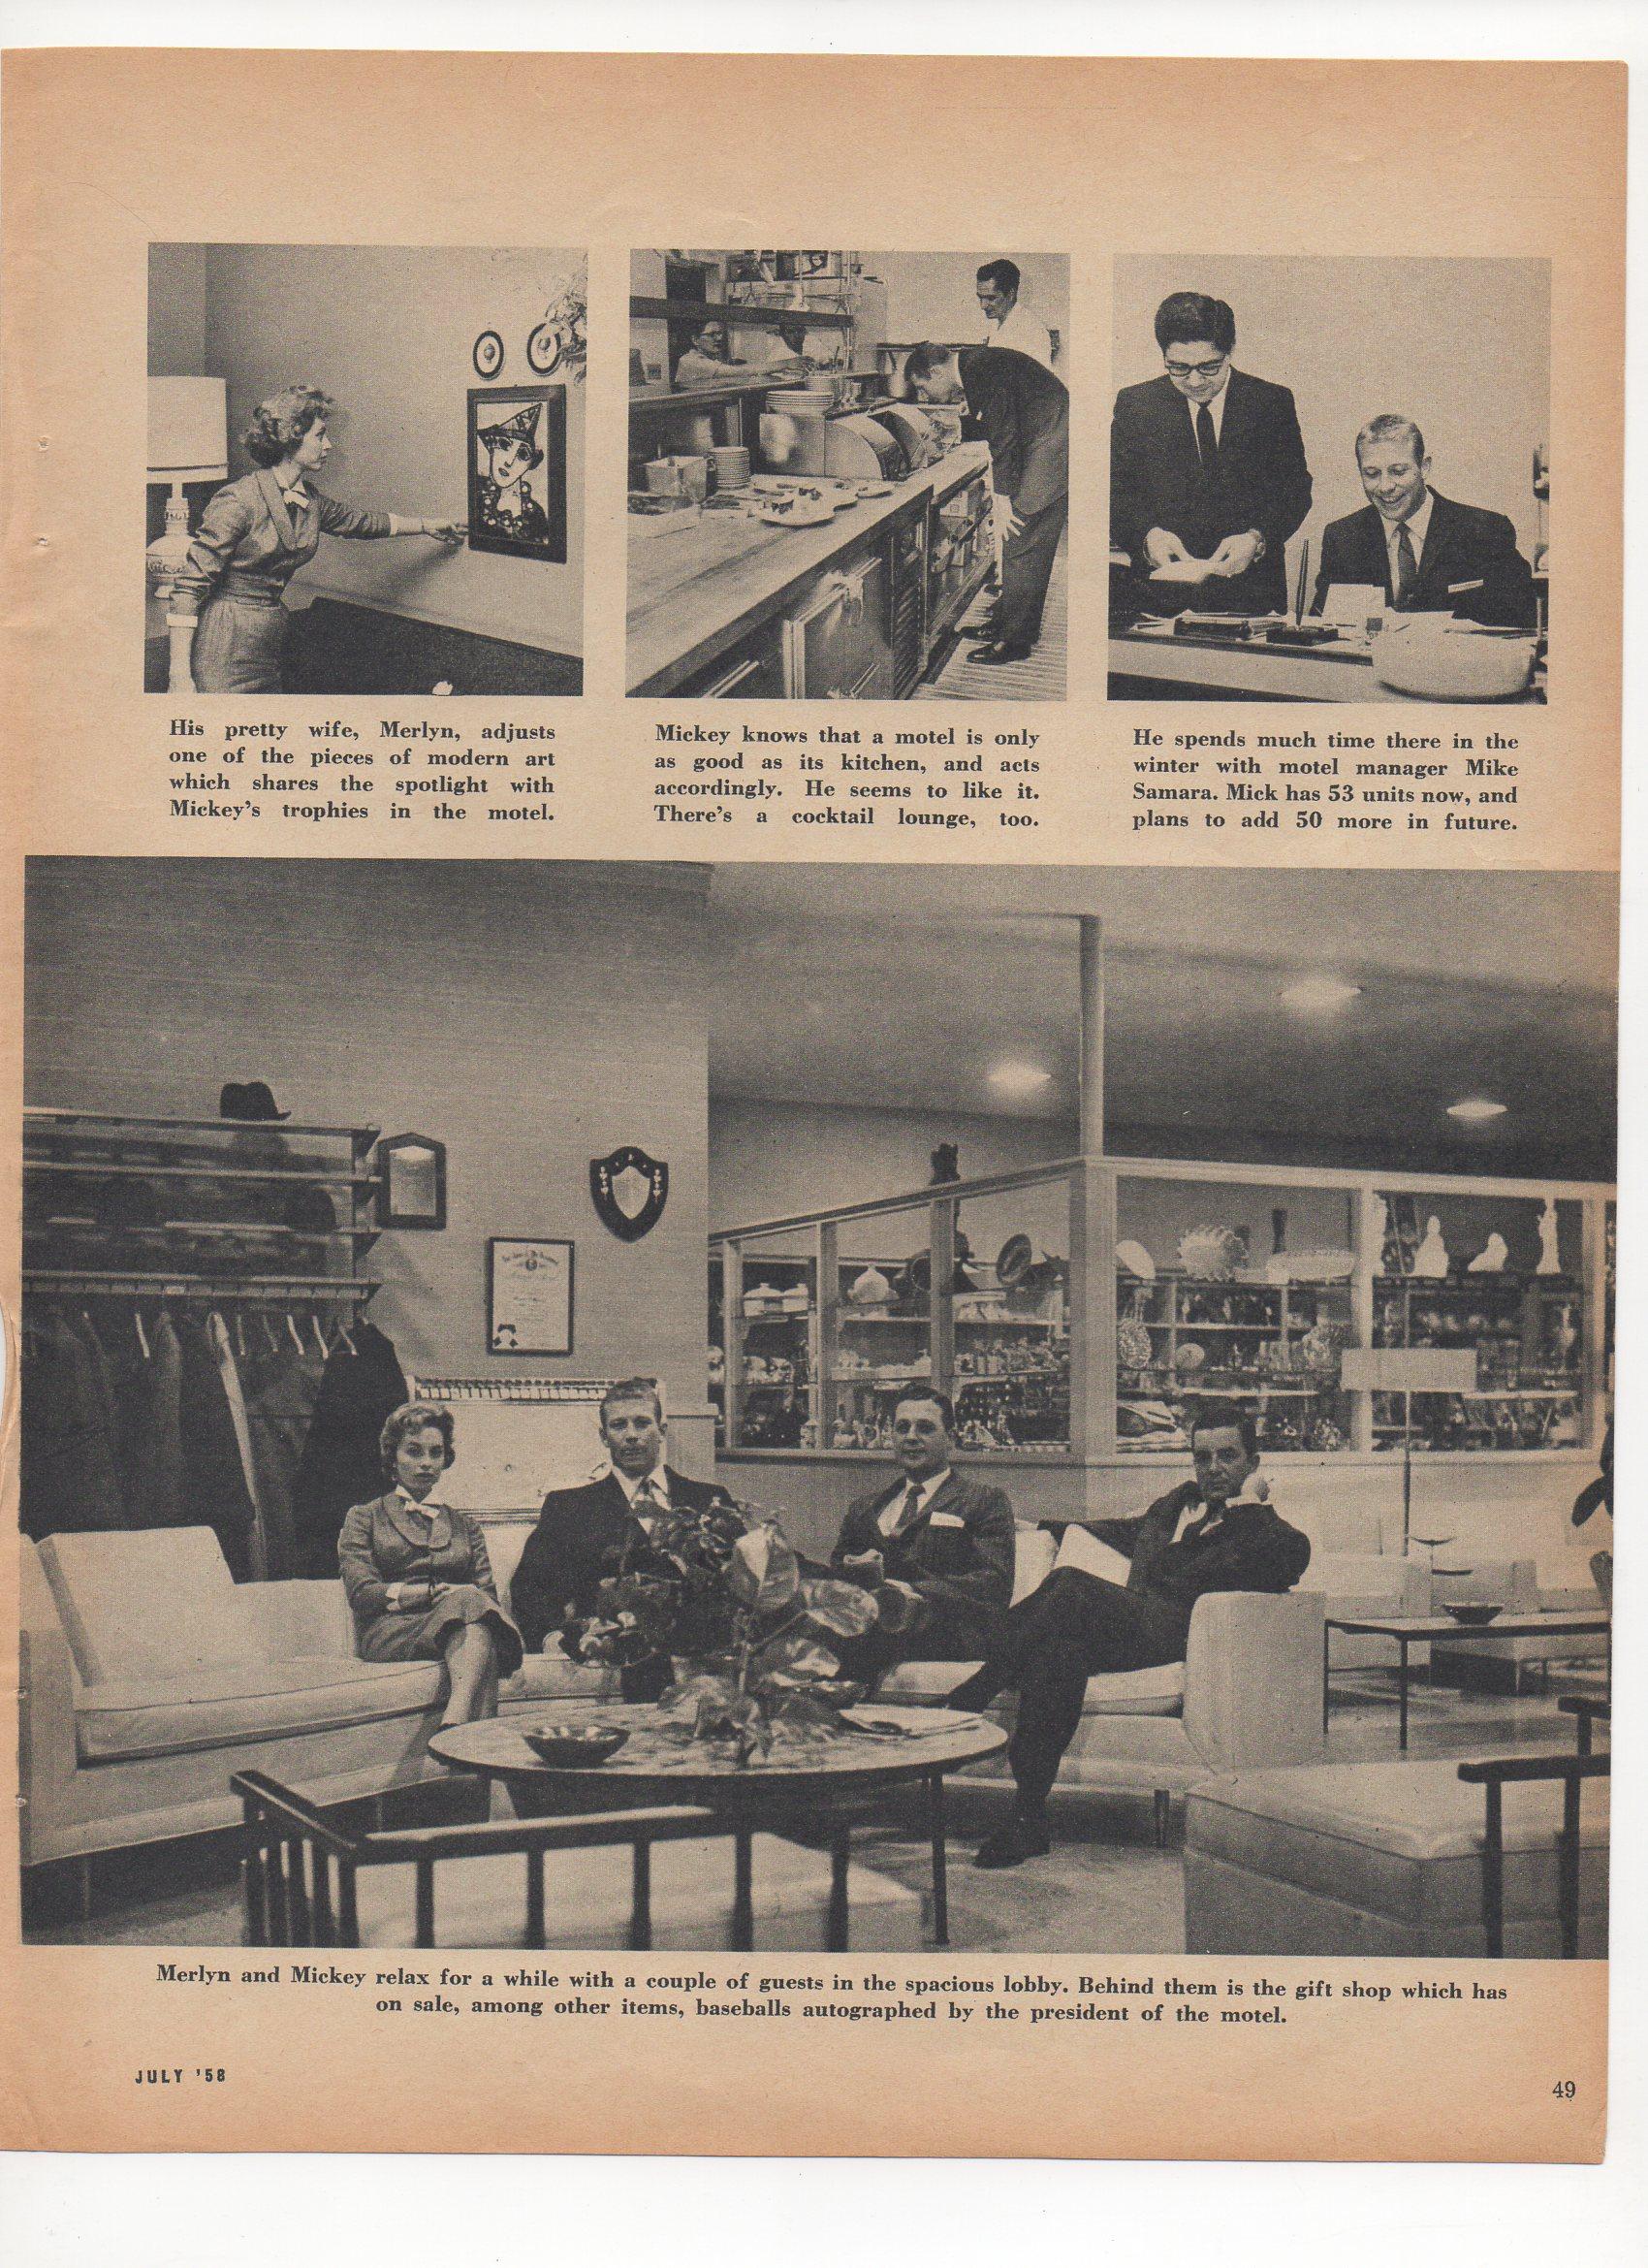 1958 sport magazine, july